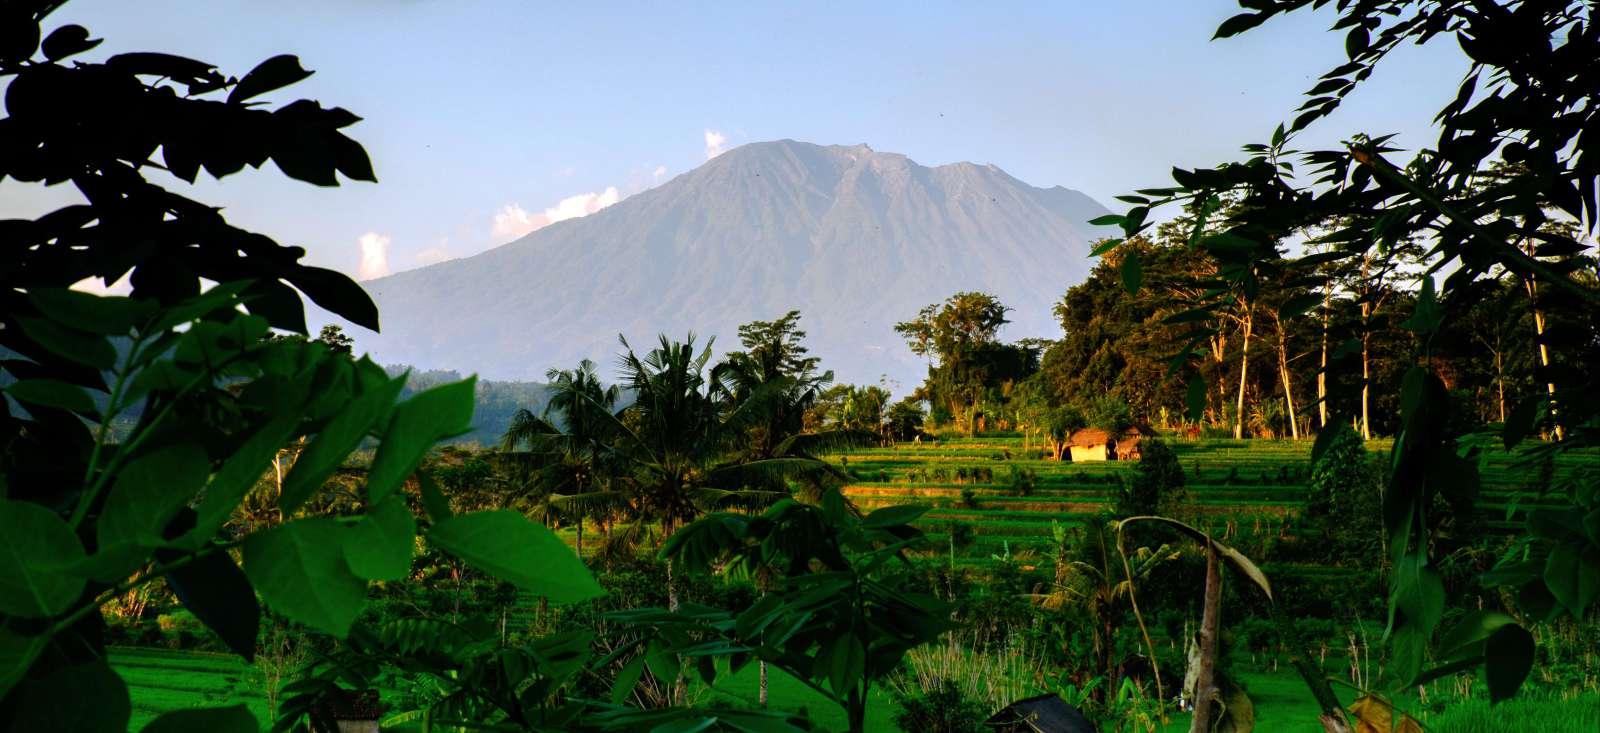 Voyage à pied : Mon petit trip à Bali